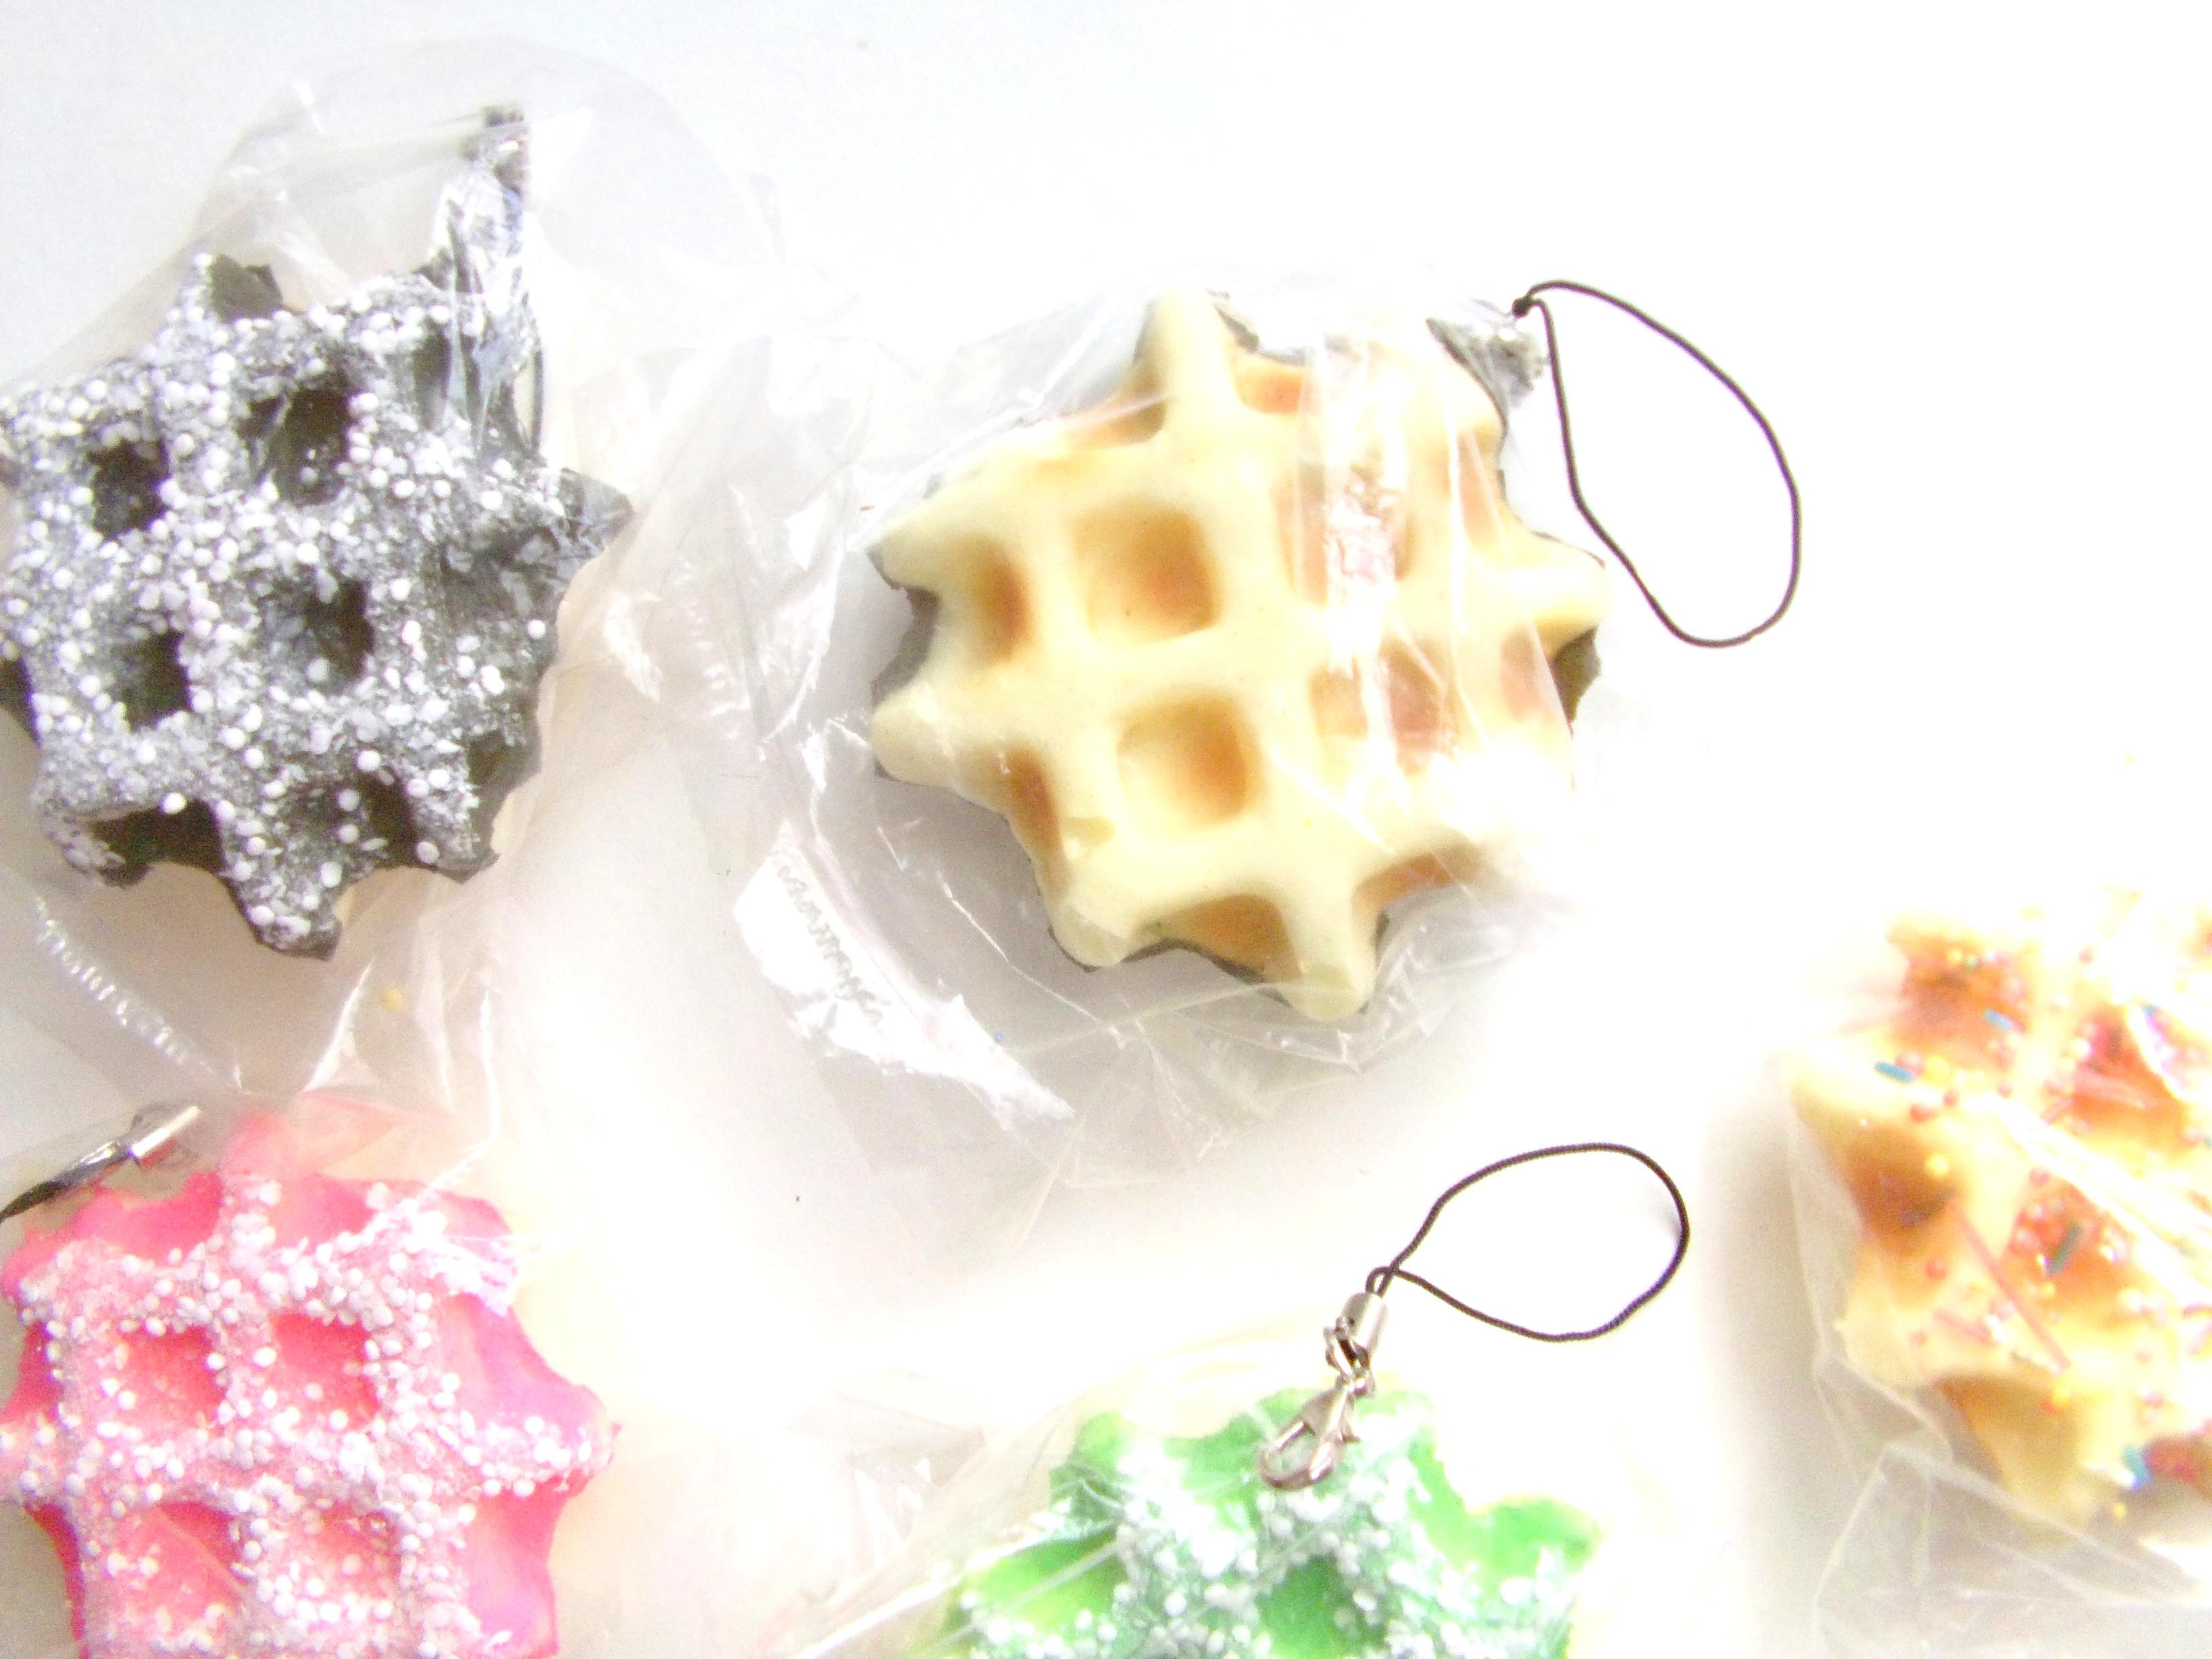 Squishy Collection Blog : Kawaii Squishy Shop 2015 Personal Blog